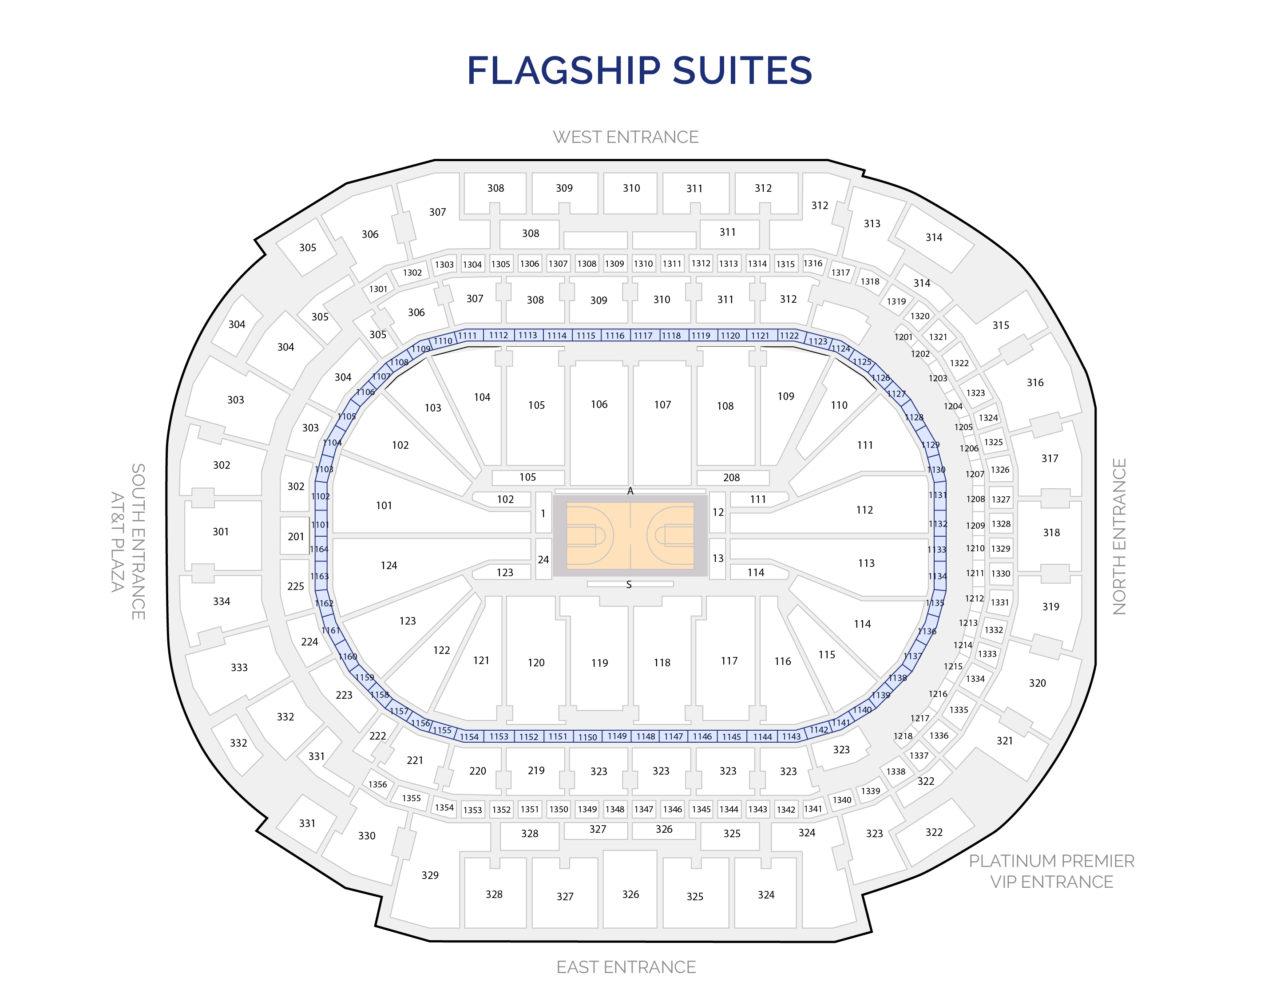 Dallas Mavericks Suites - Flagship Luxury Suites